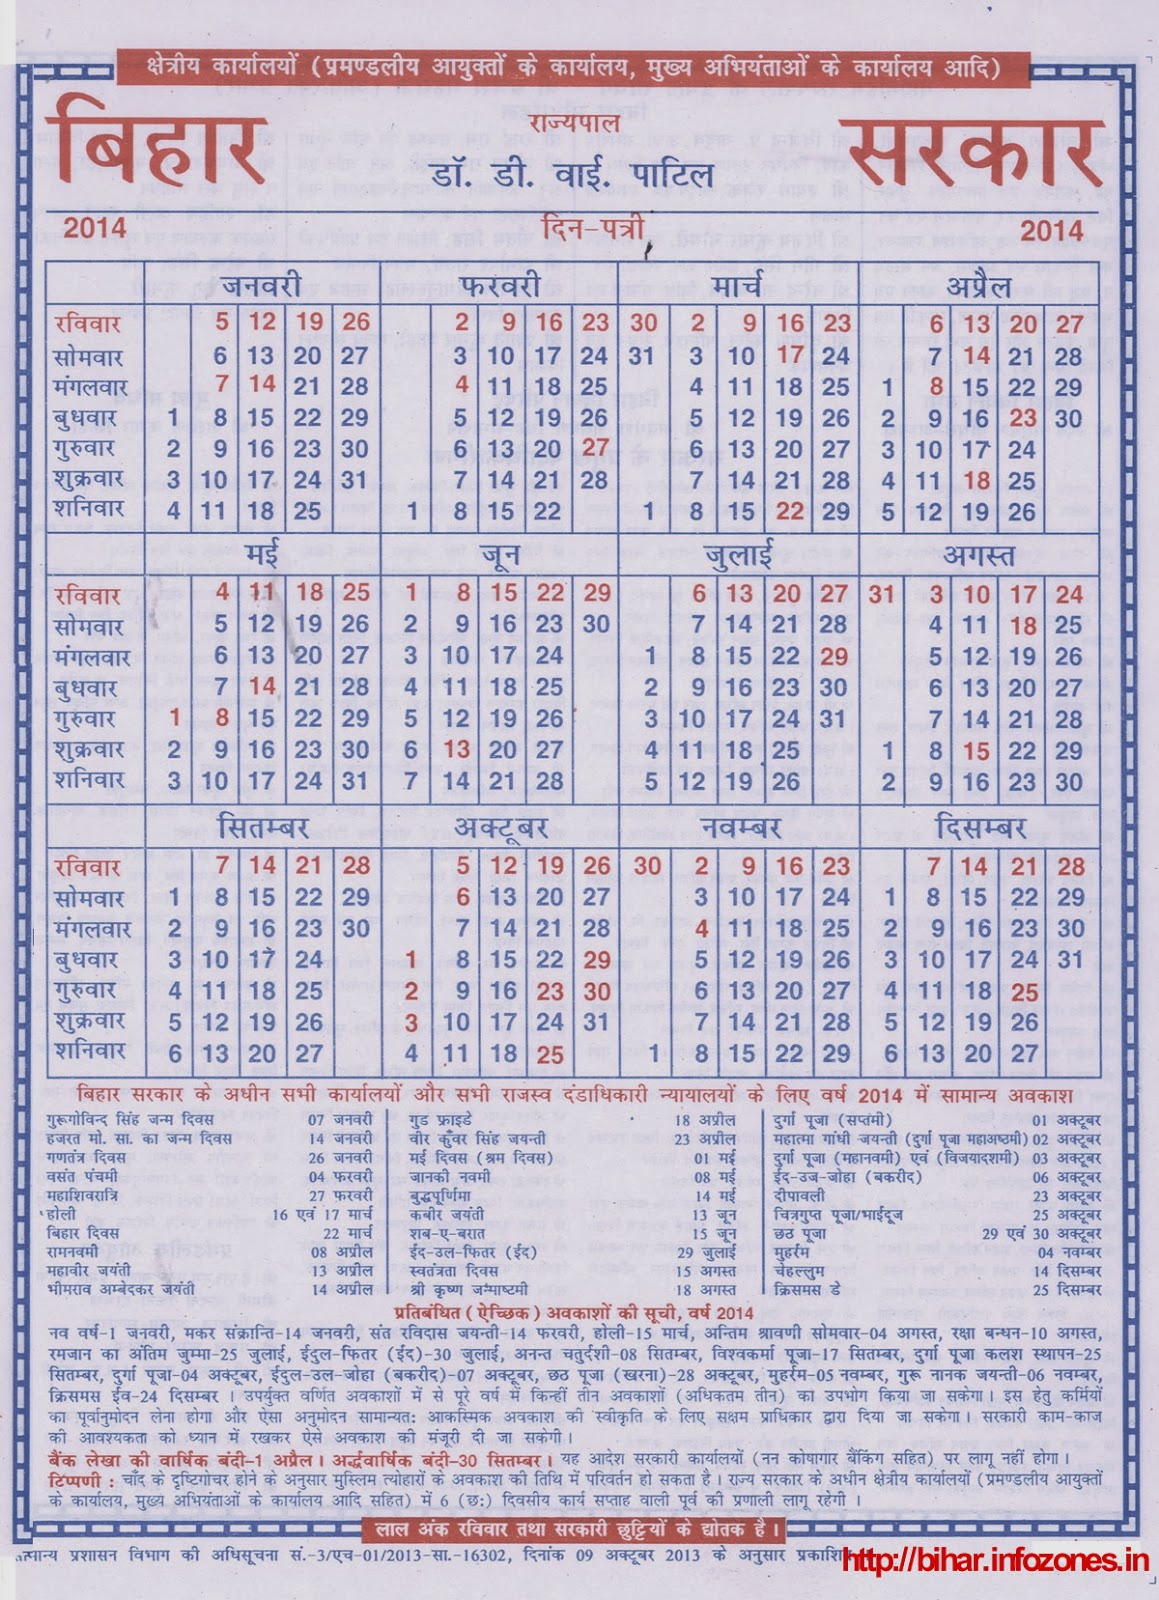 Bihar Government Calendar 2014 inside Bihar Government Calender